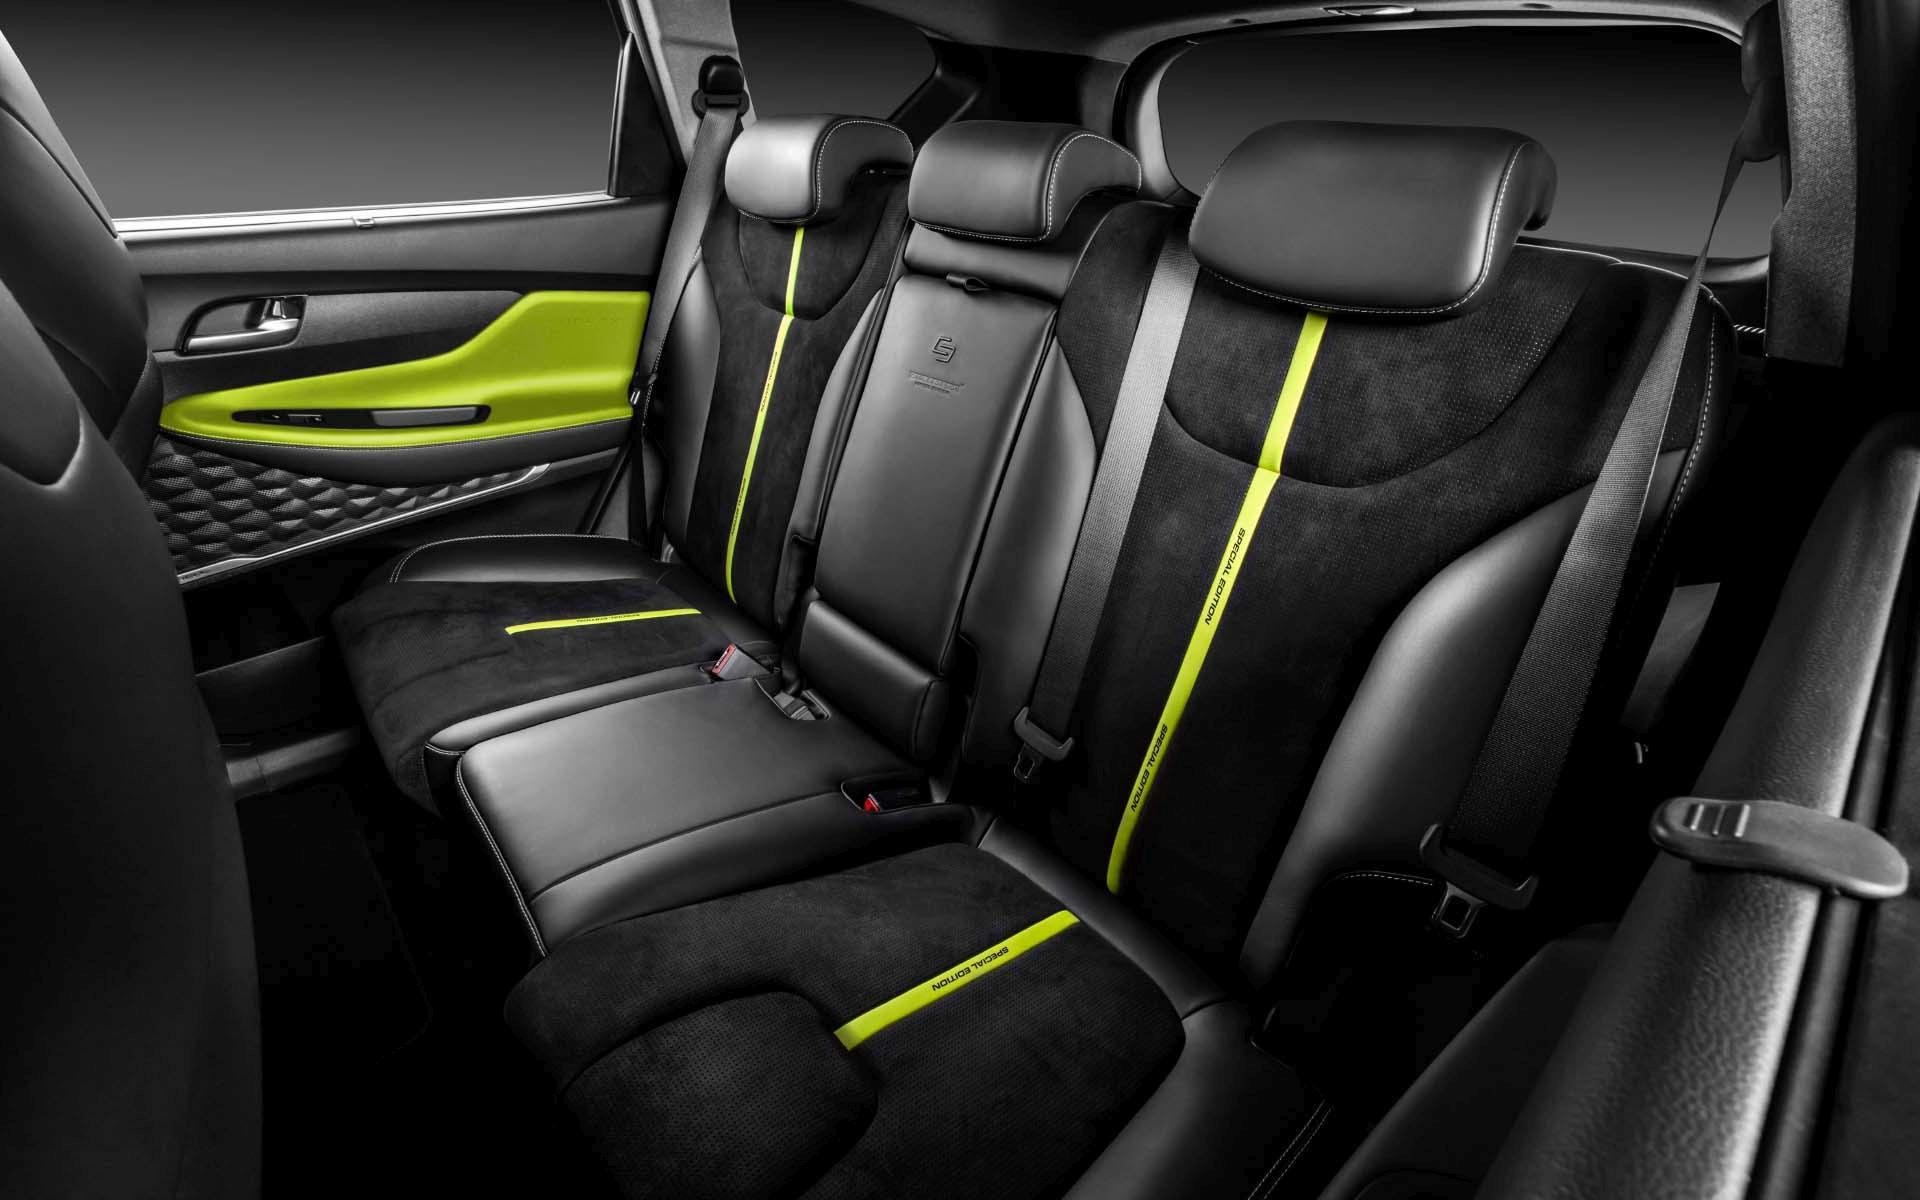 Hyundai-Santa-Fe-by-Carlex-Design-23